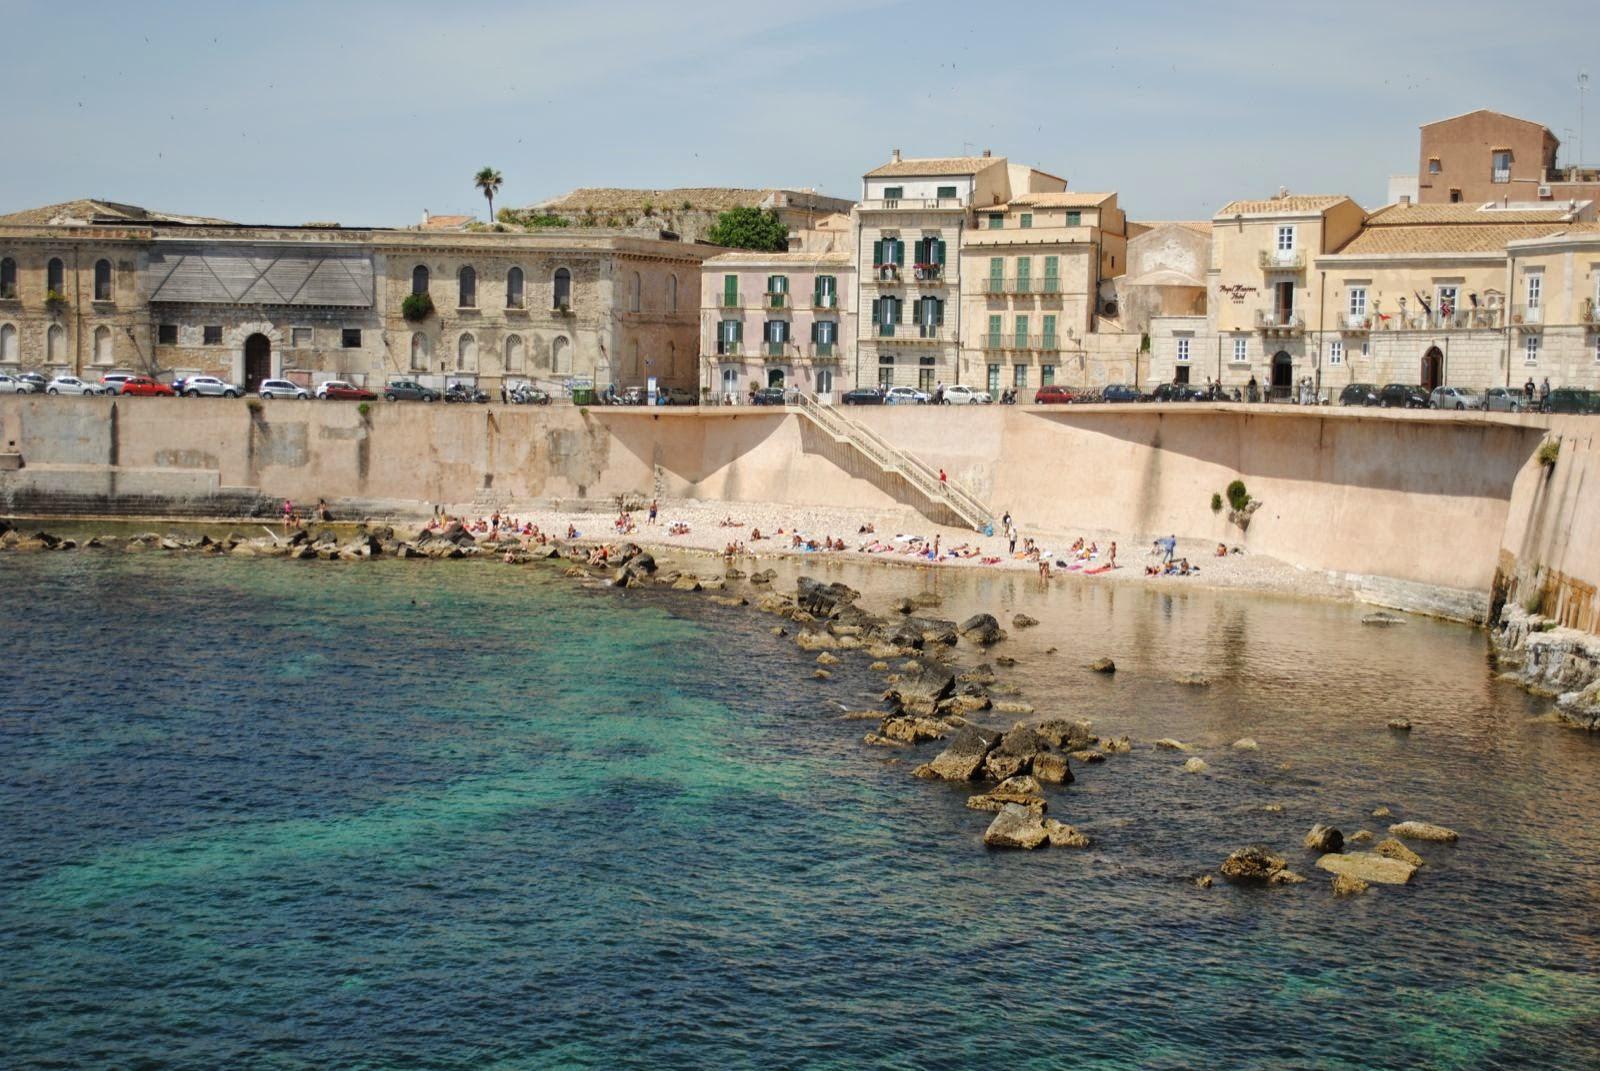 The Small Beach Near Our Hotel On Island Of Ortigia